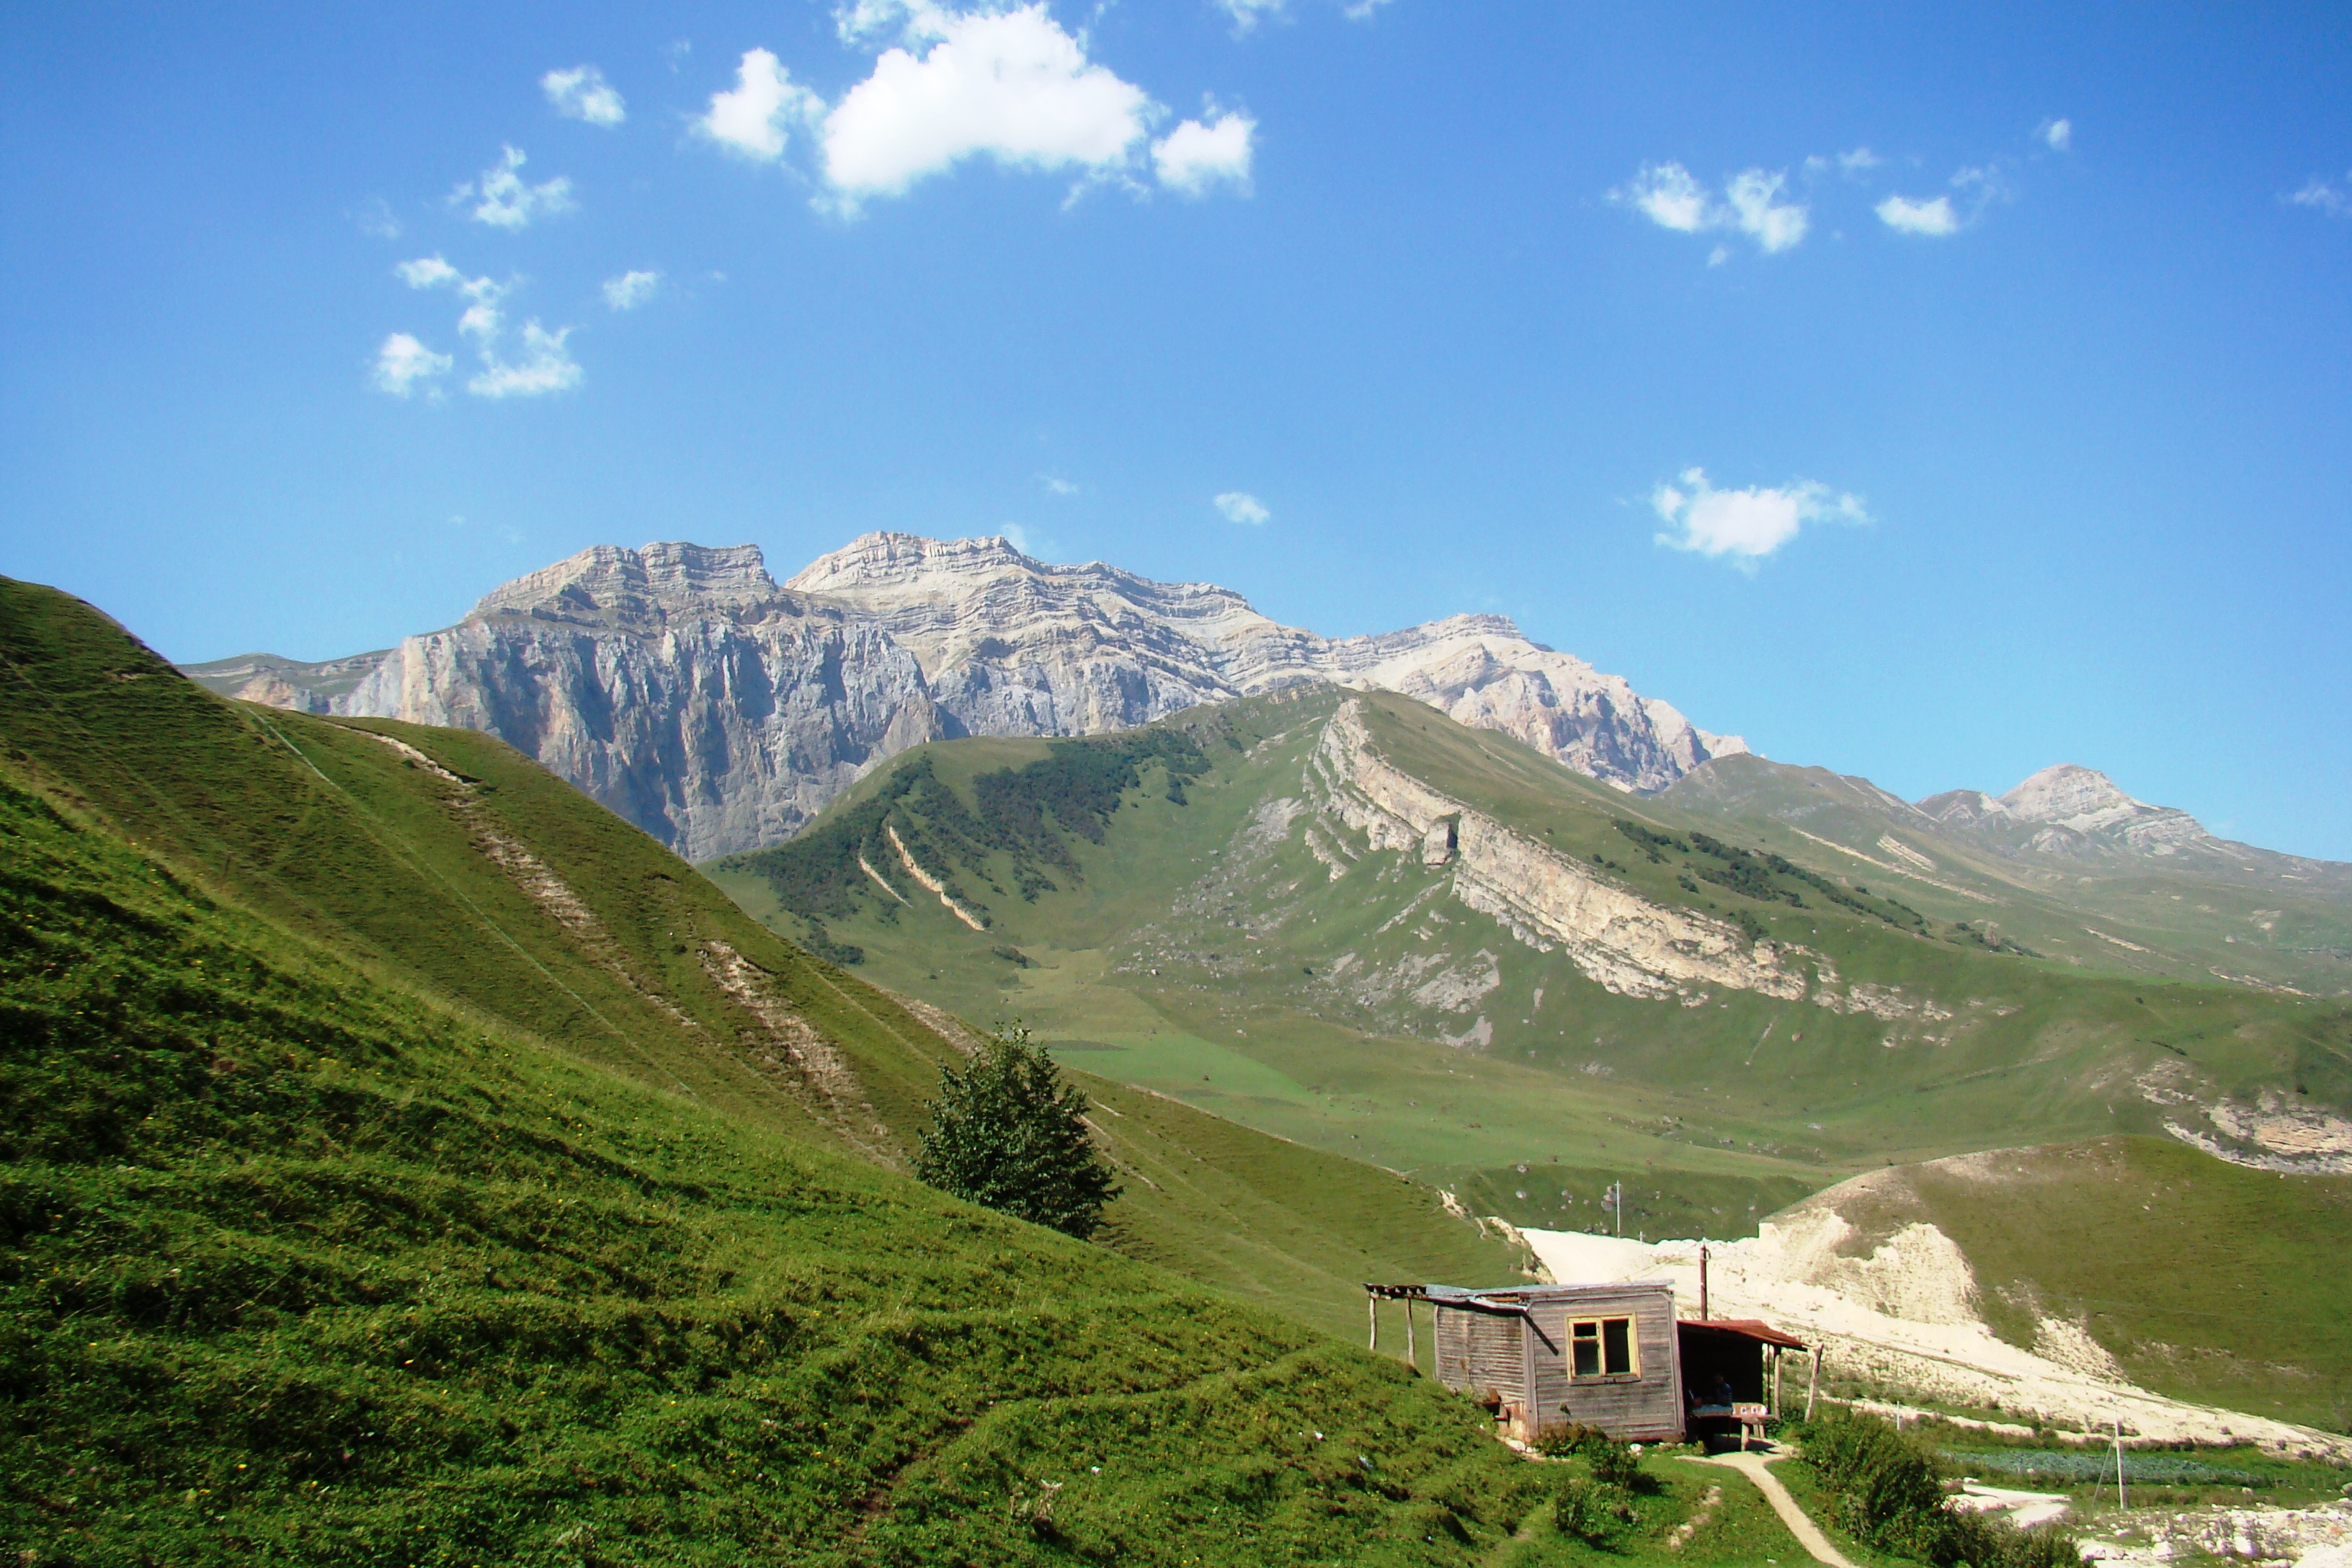 File:Şahdağ Mountain, Qusar, 2013.JPG - Wikimedia Commons